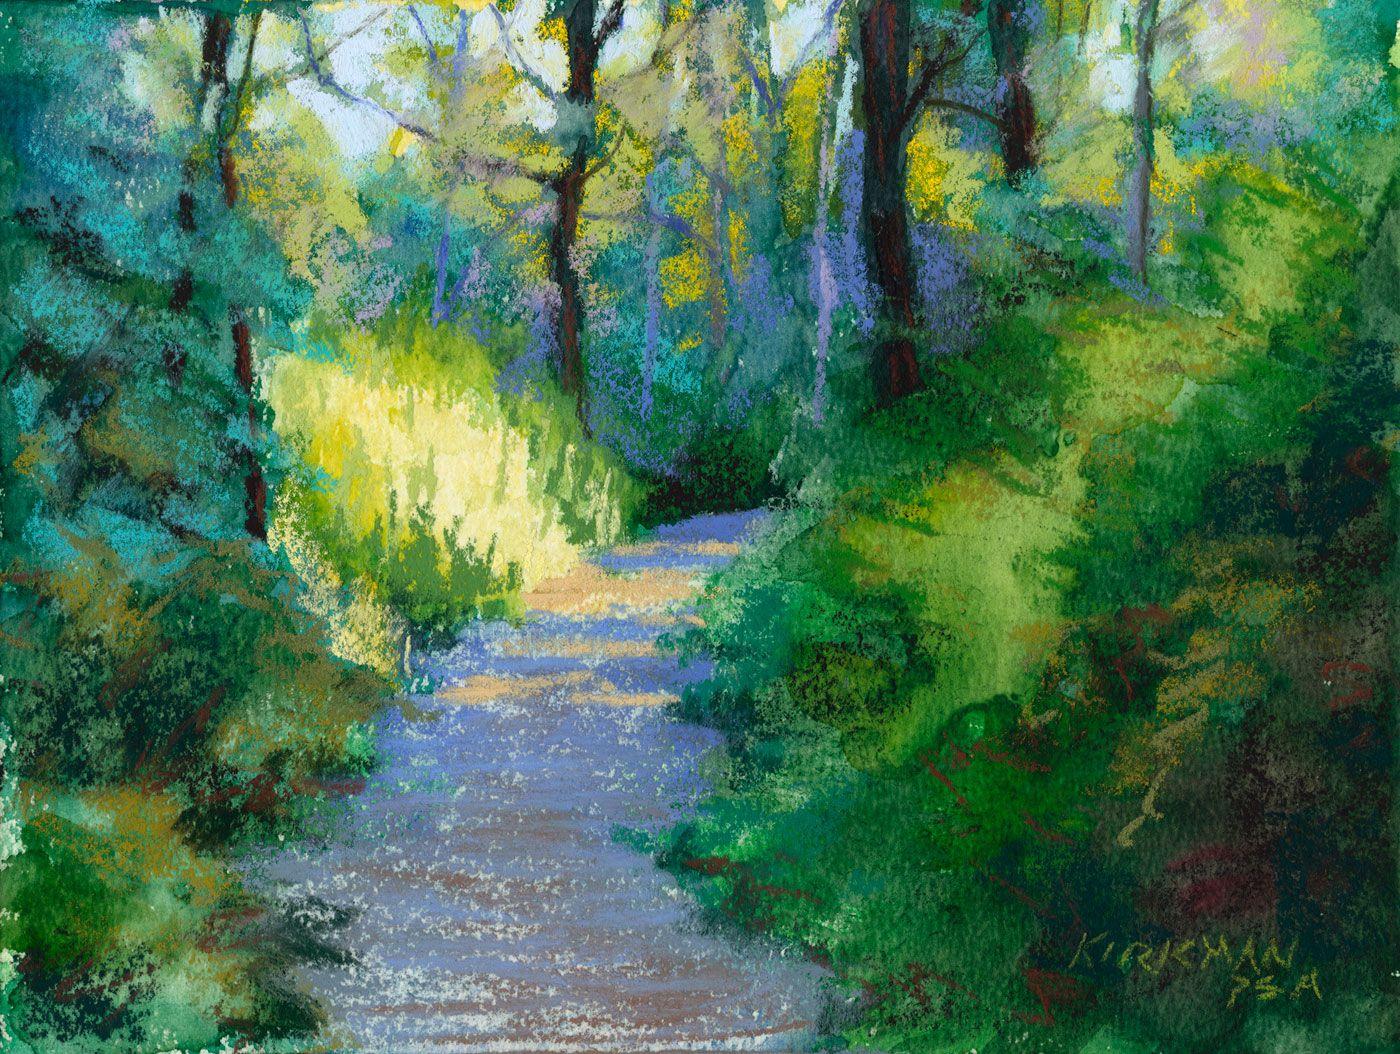 Fine watercolor art for sale - Rita Kirkman S Daily Paintings Park Trail 24 Pastel Over Watercolor